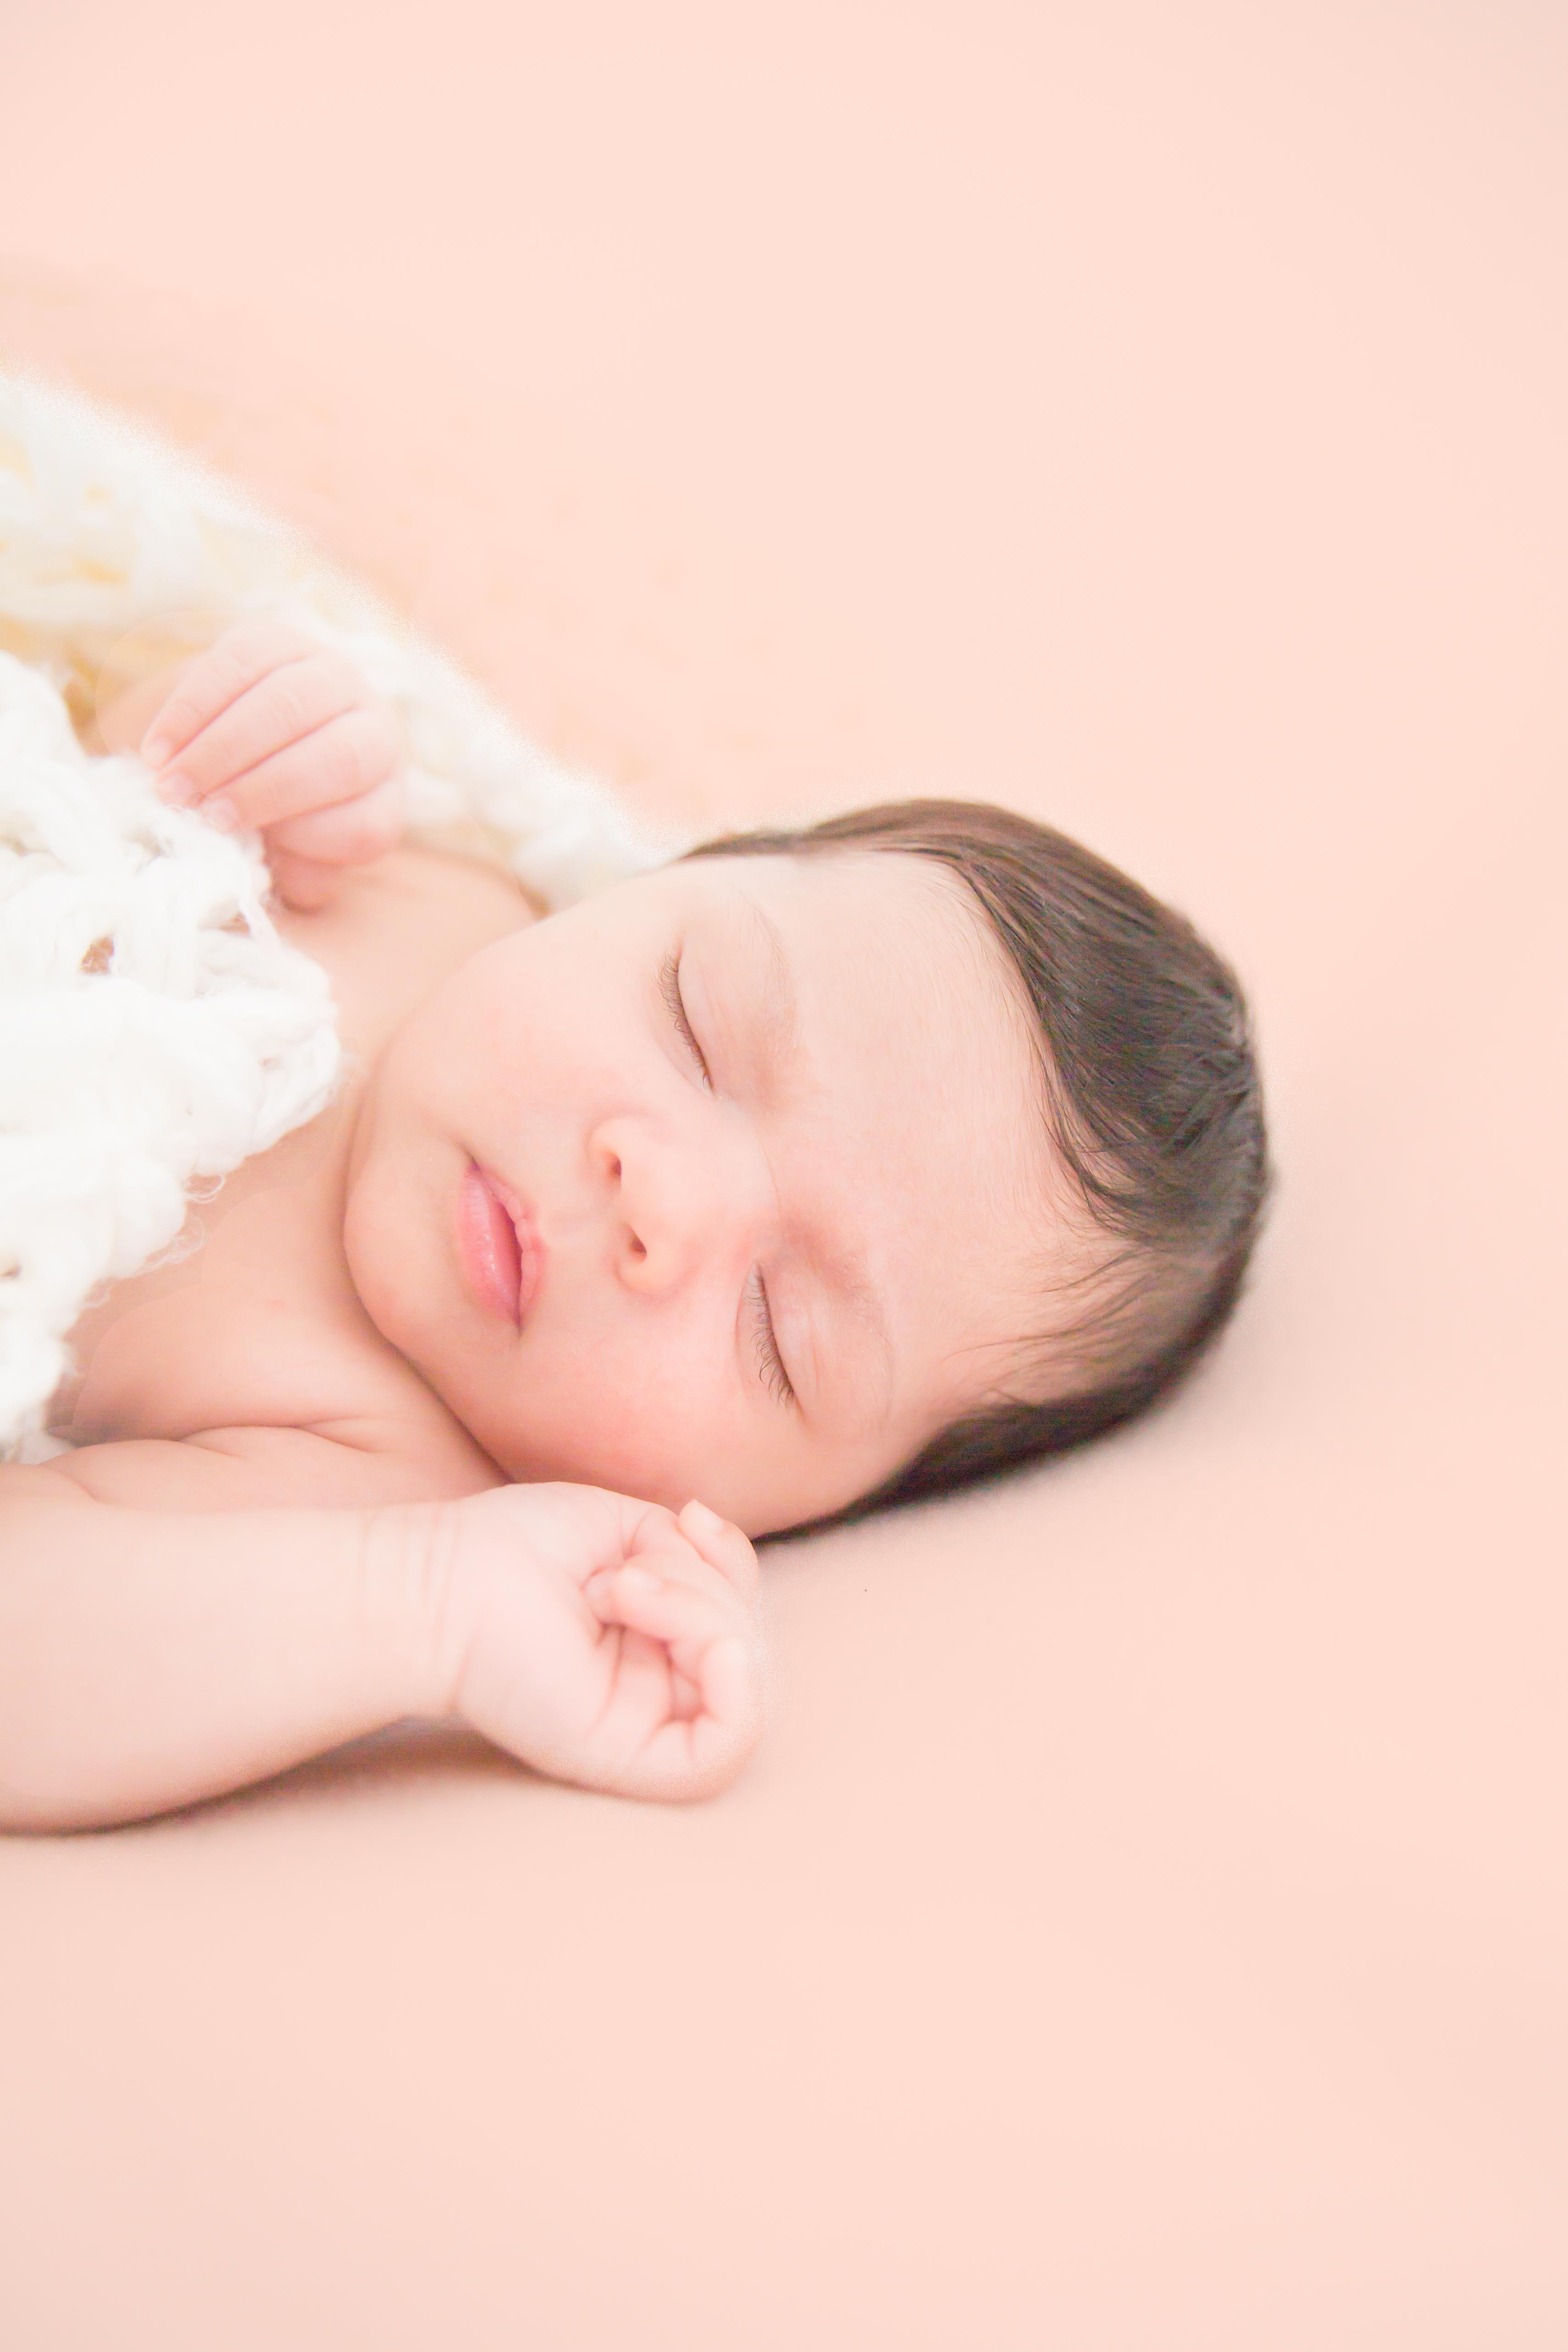 Baby Maya_Peachy dreams